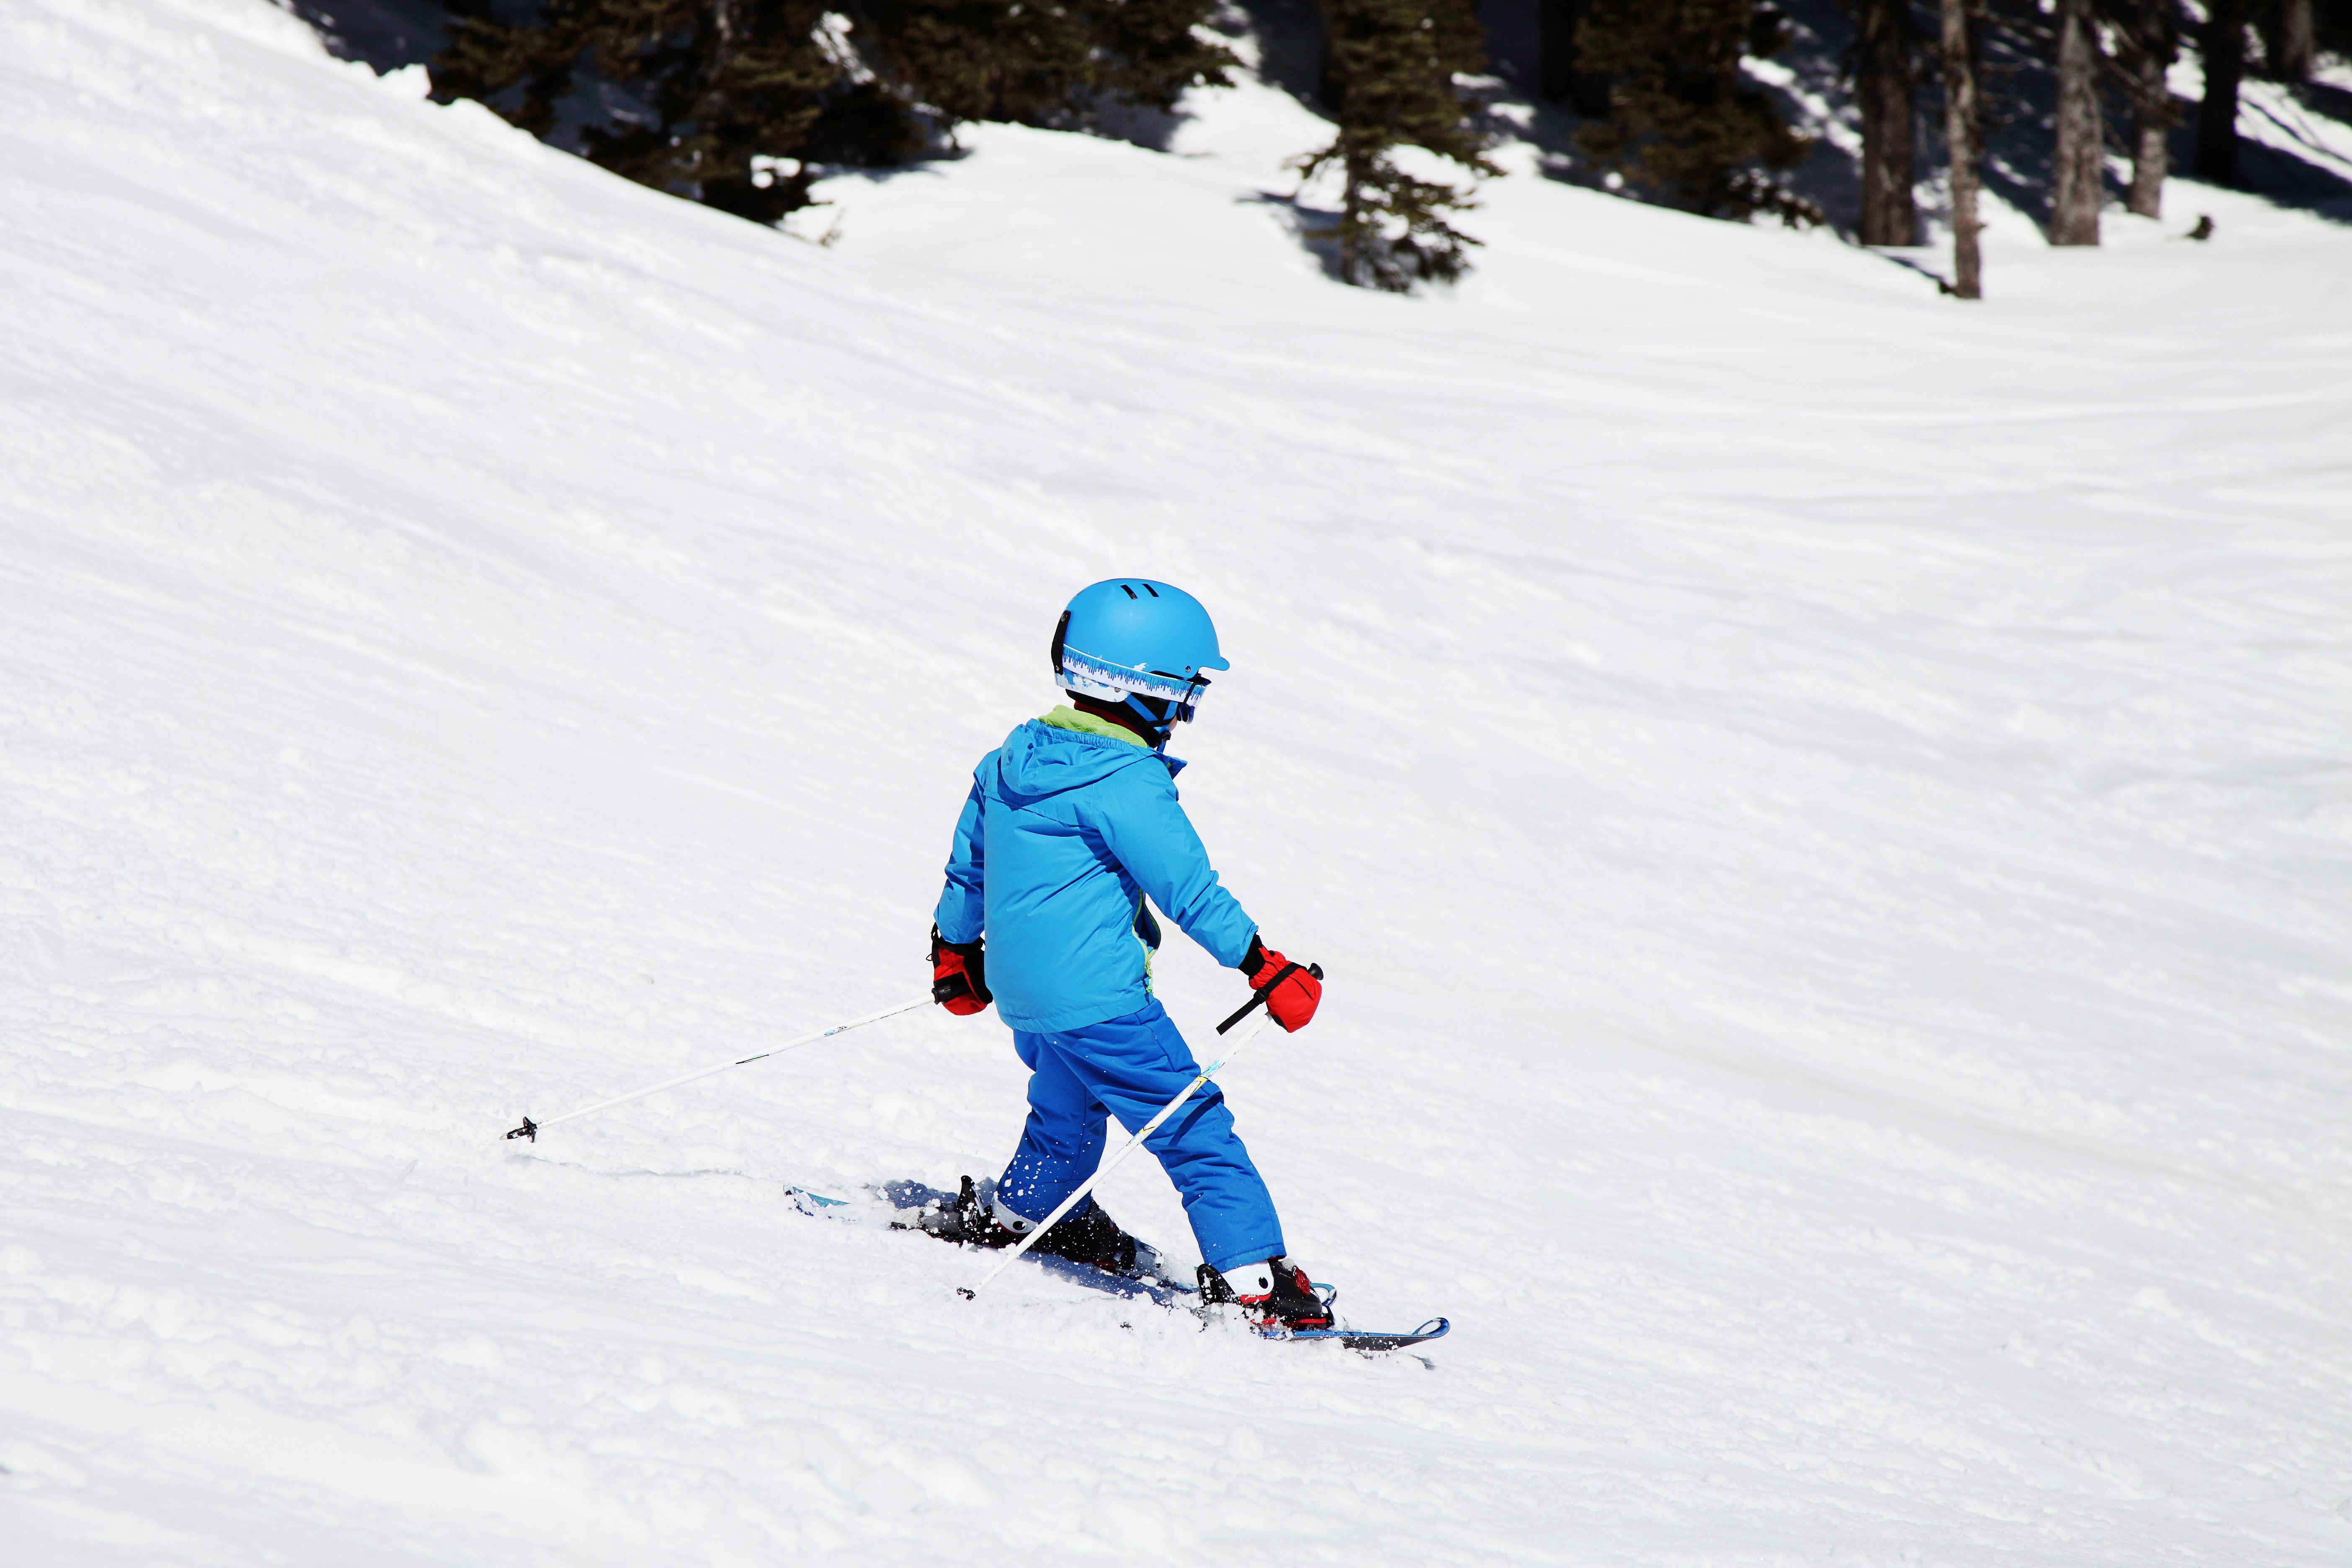 snow creek ski resort in weston, missouri